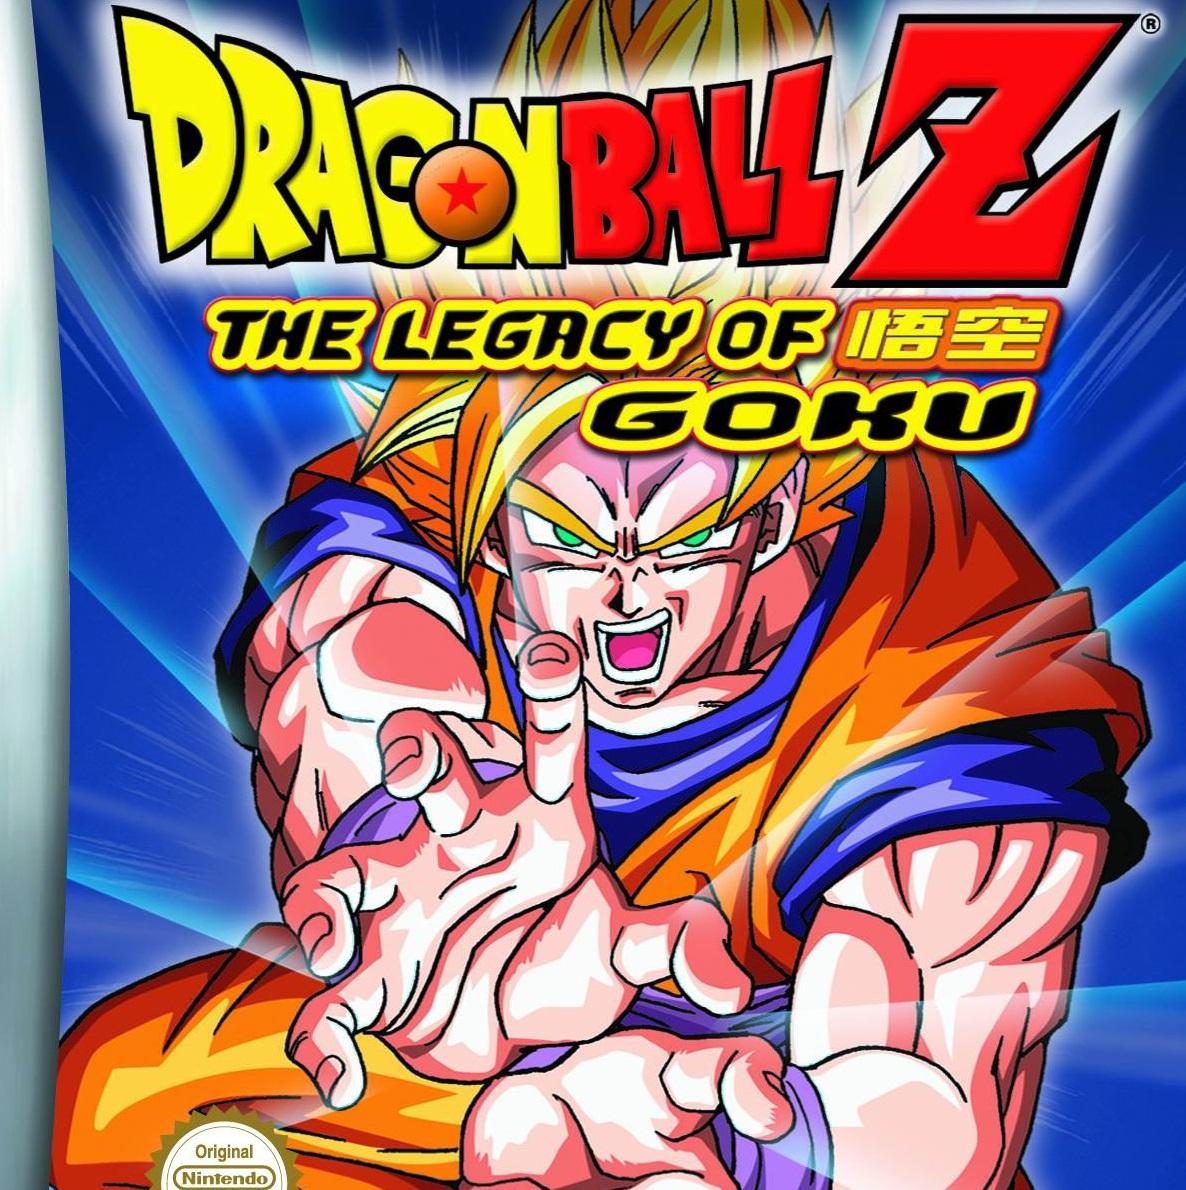 Gameboy color emulator online - Pokemon Frosty Dragon Ball Z The Legacy Of Goku